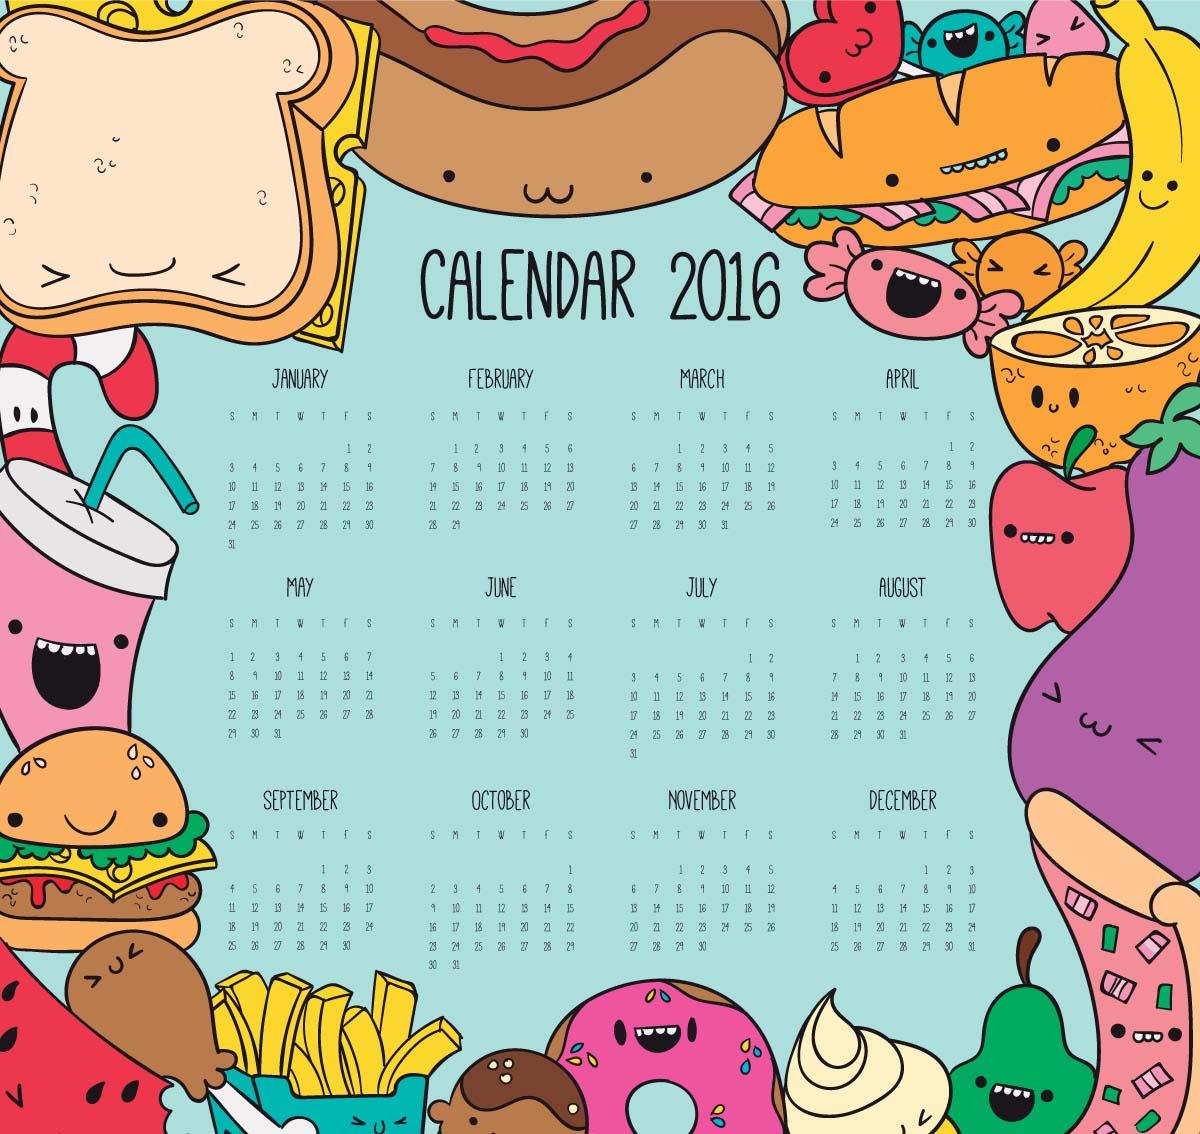 Cute cartoon calendar for 2016 year with fast food